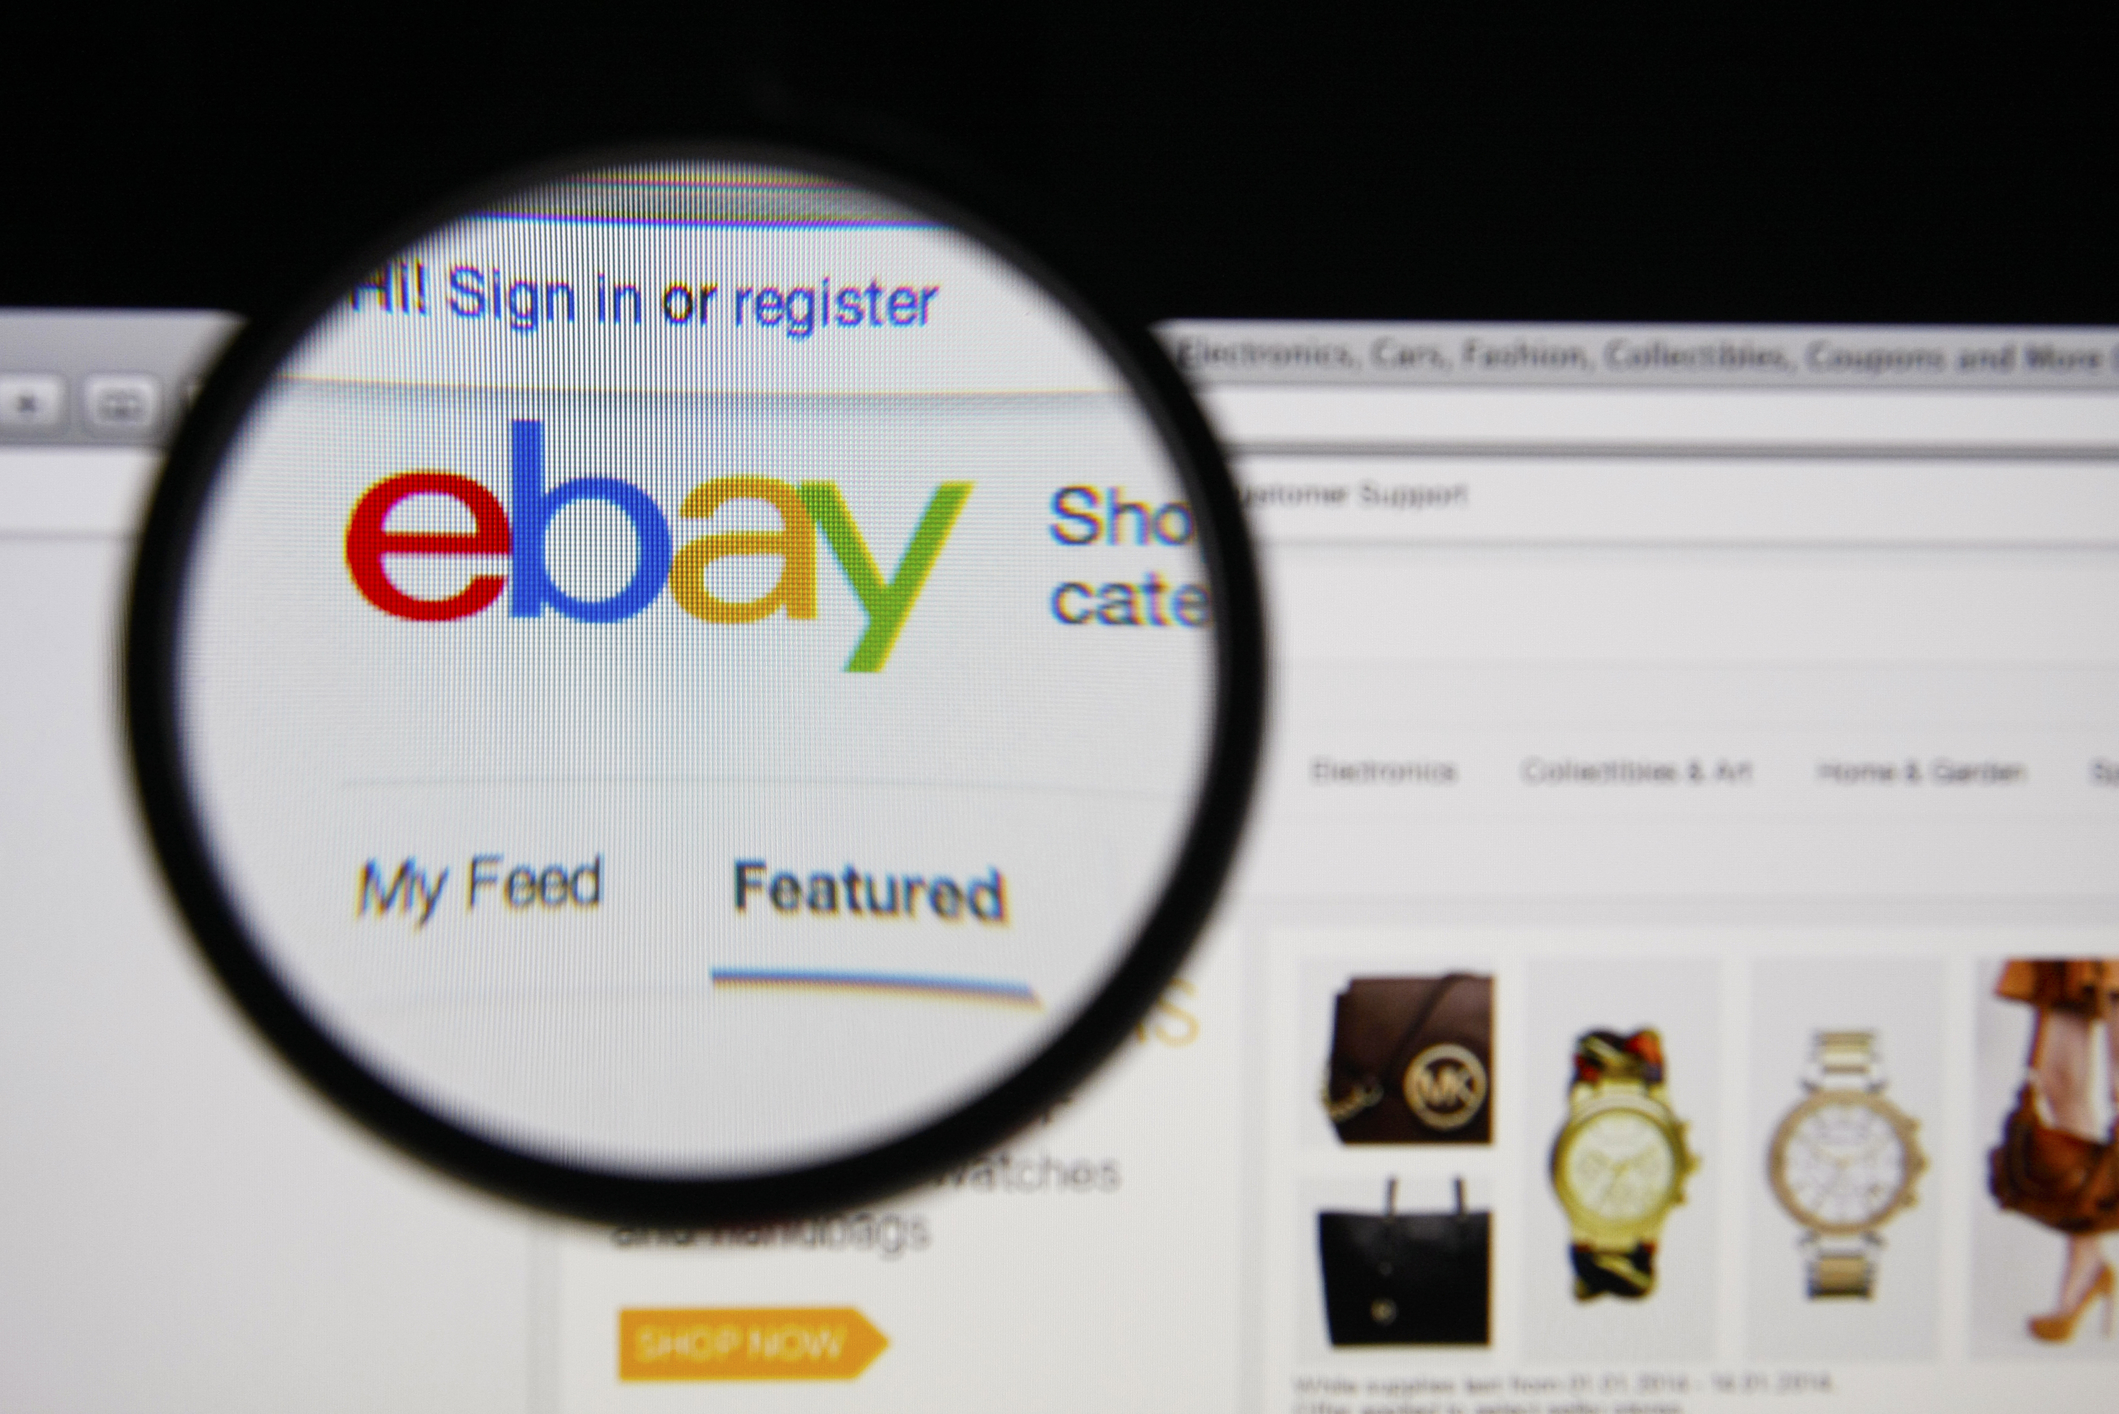 ebay trust deals